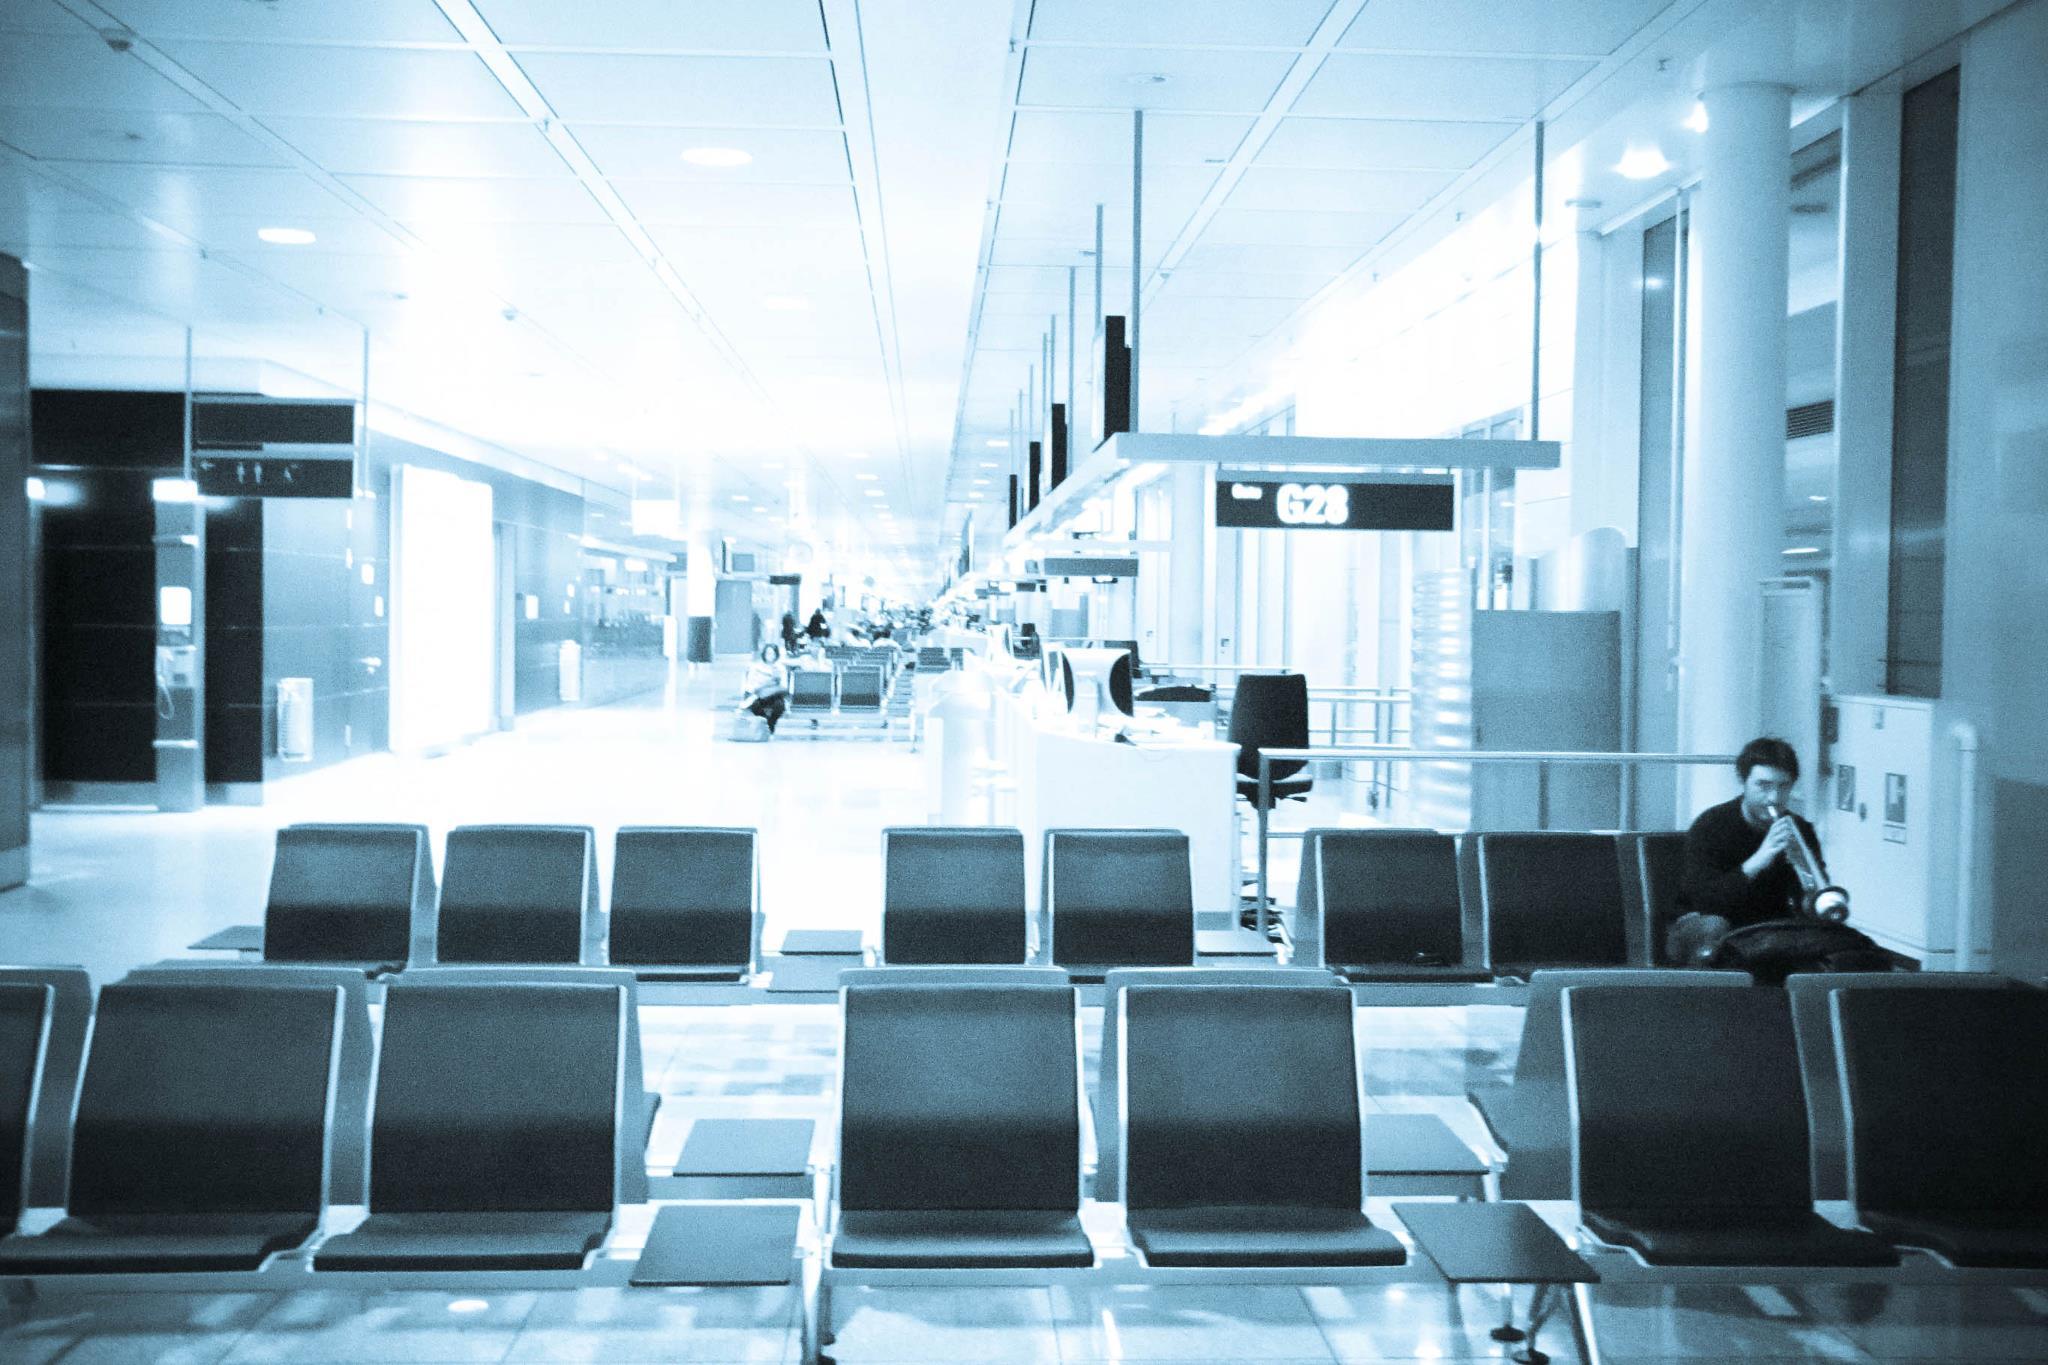 berlino aereoporto